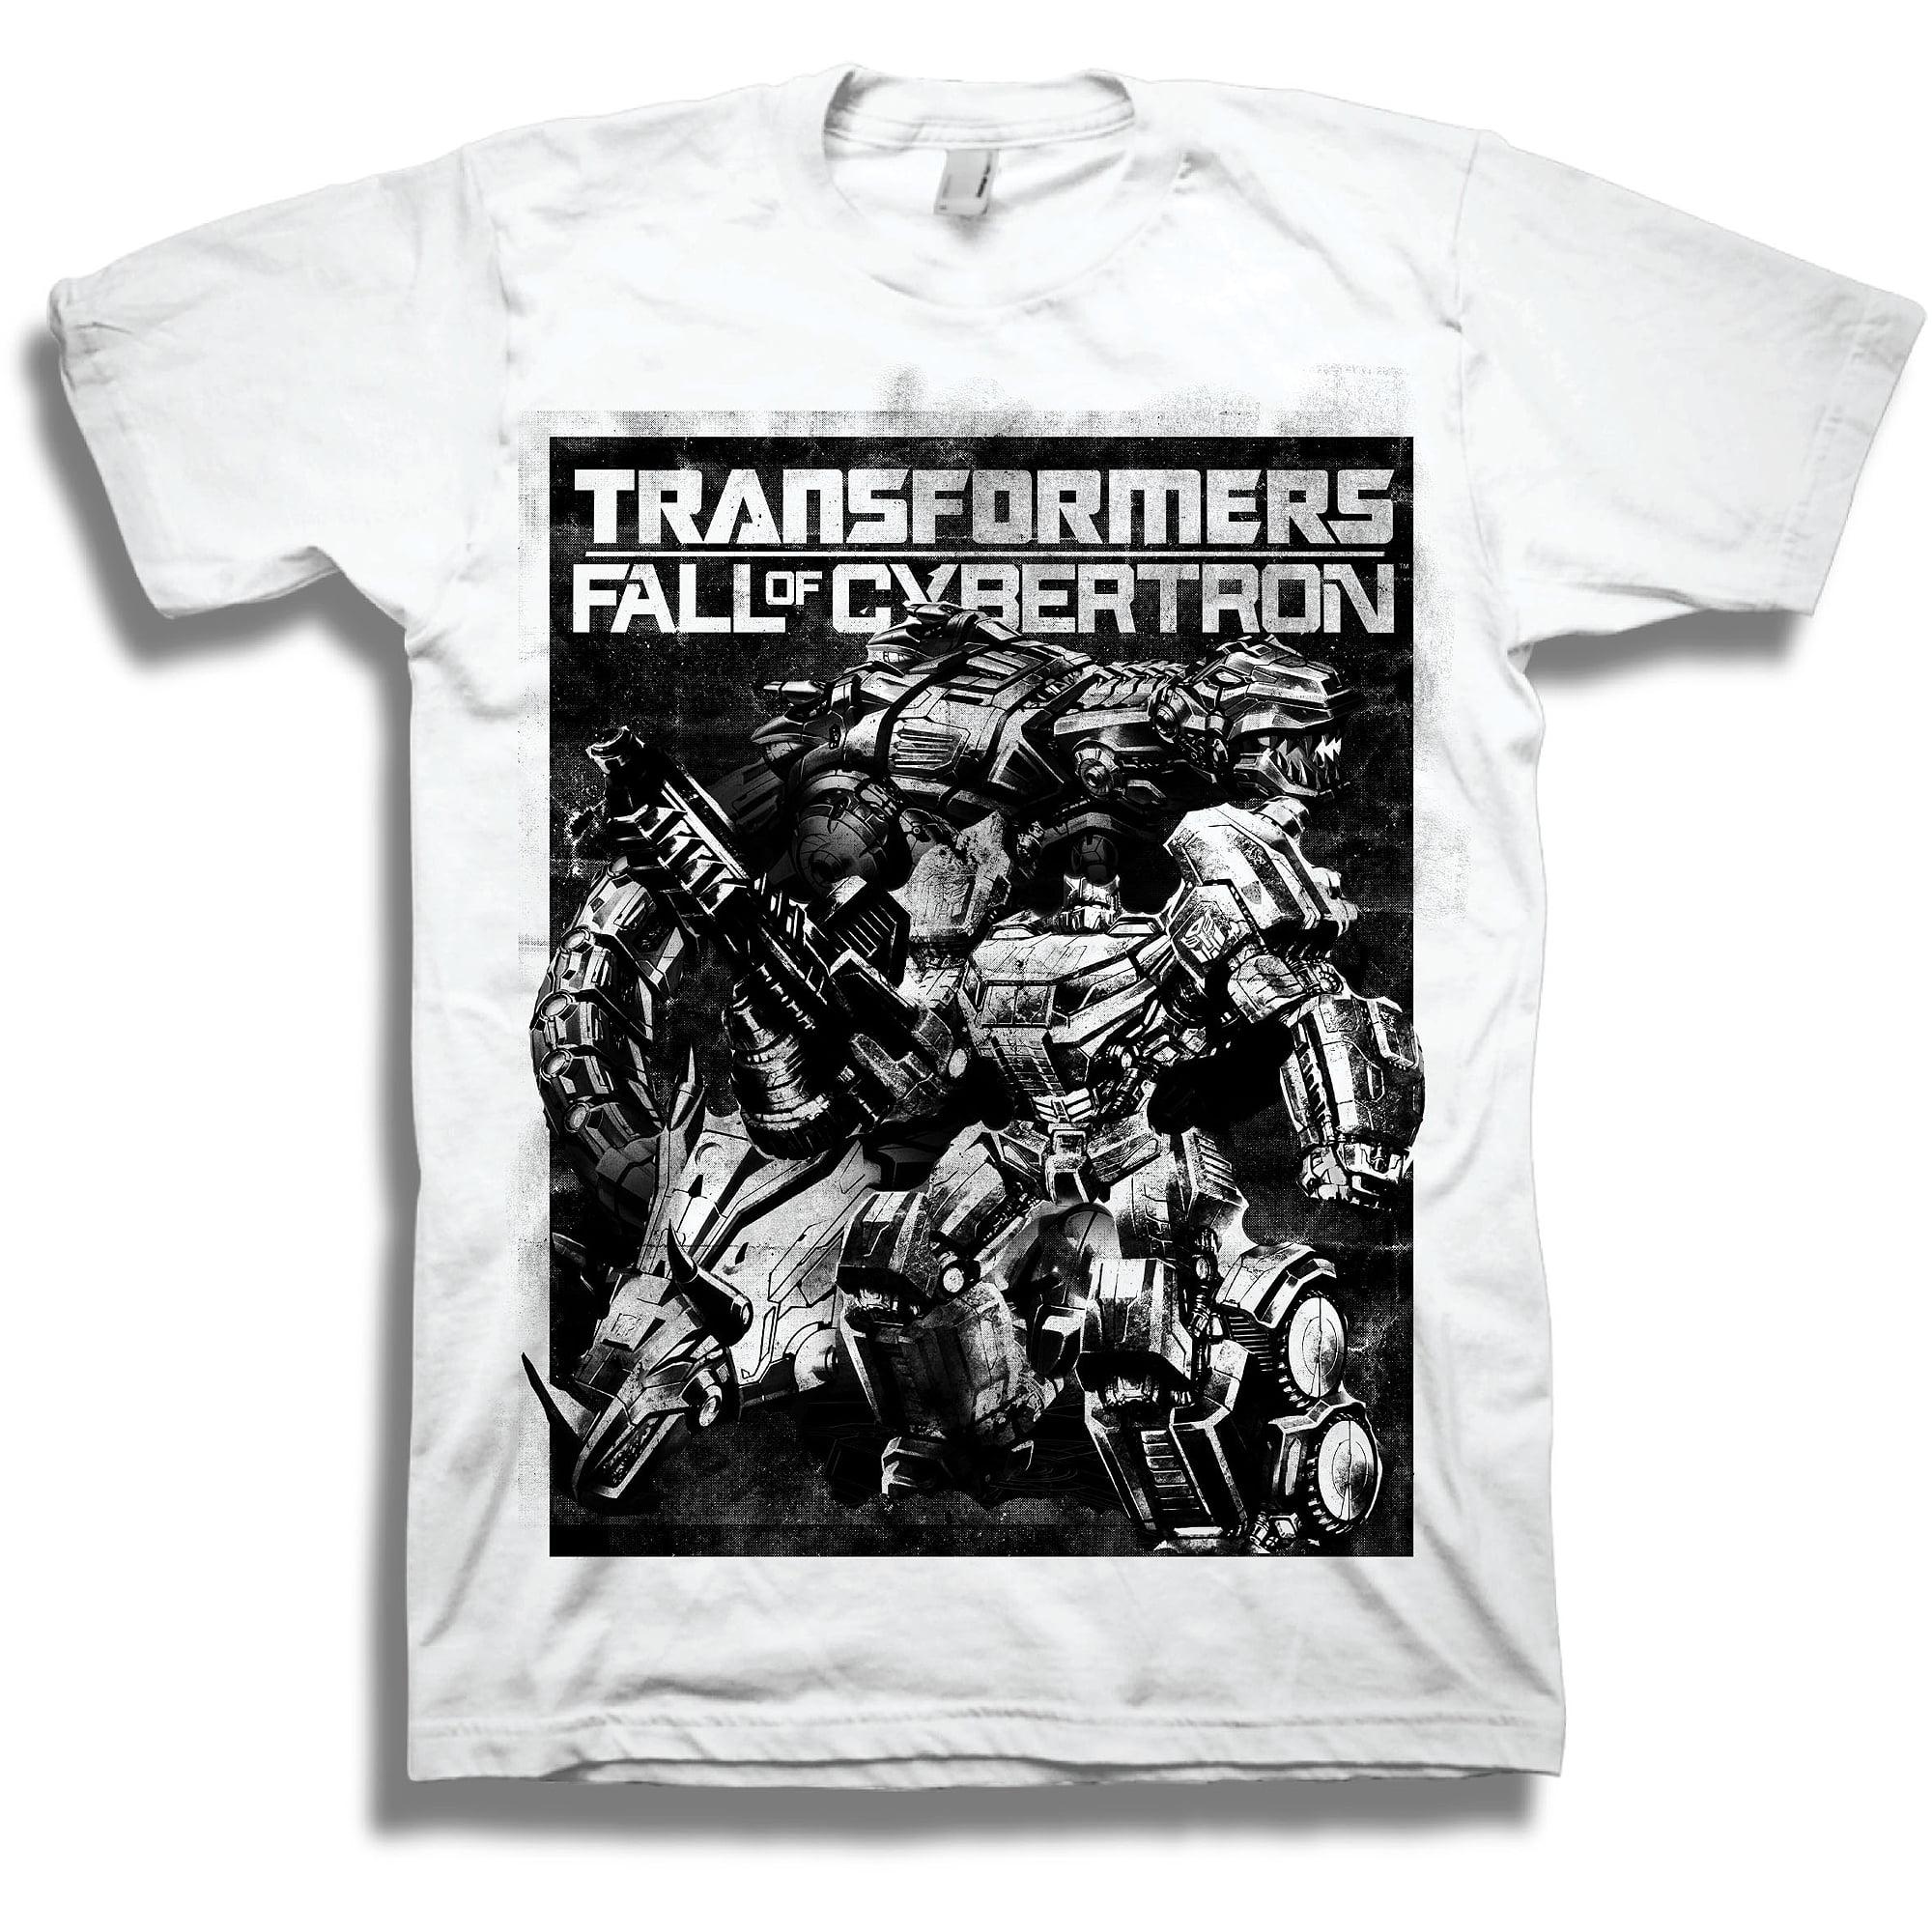 Big Mens Transformers B&W Fall of Cybertron Graphic Tee